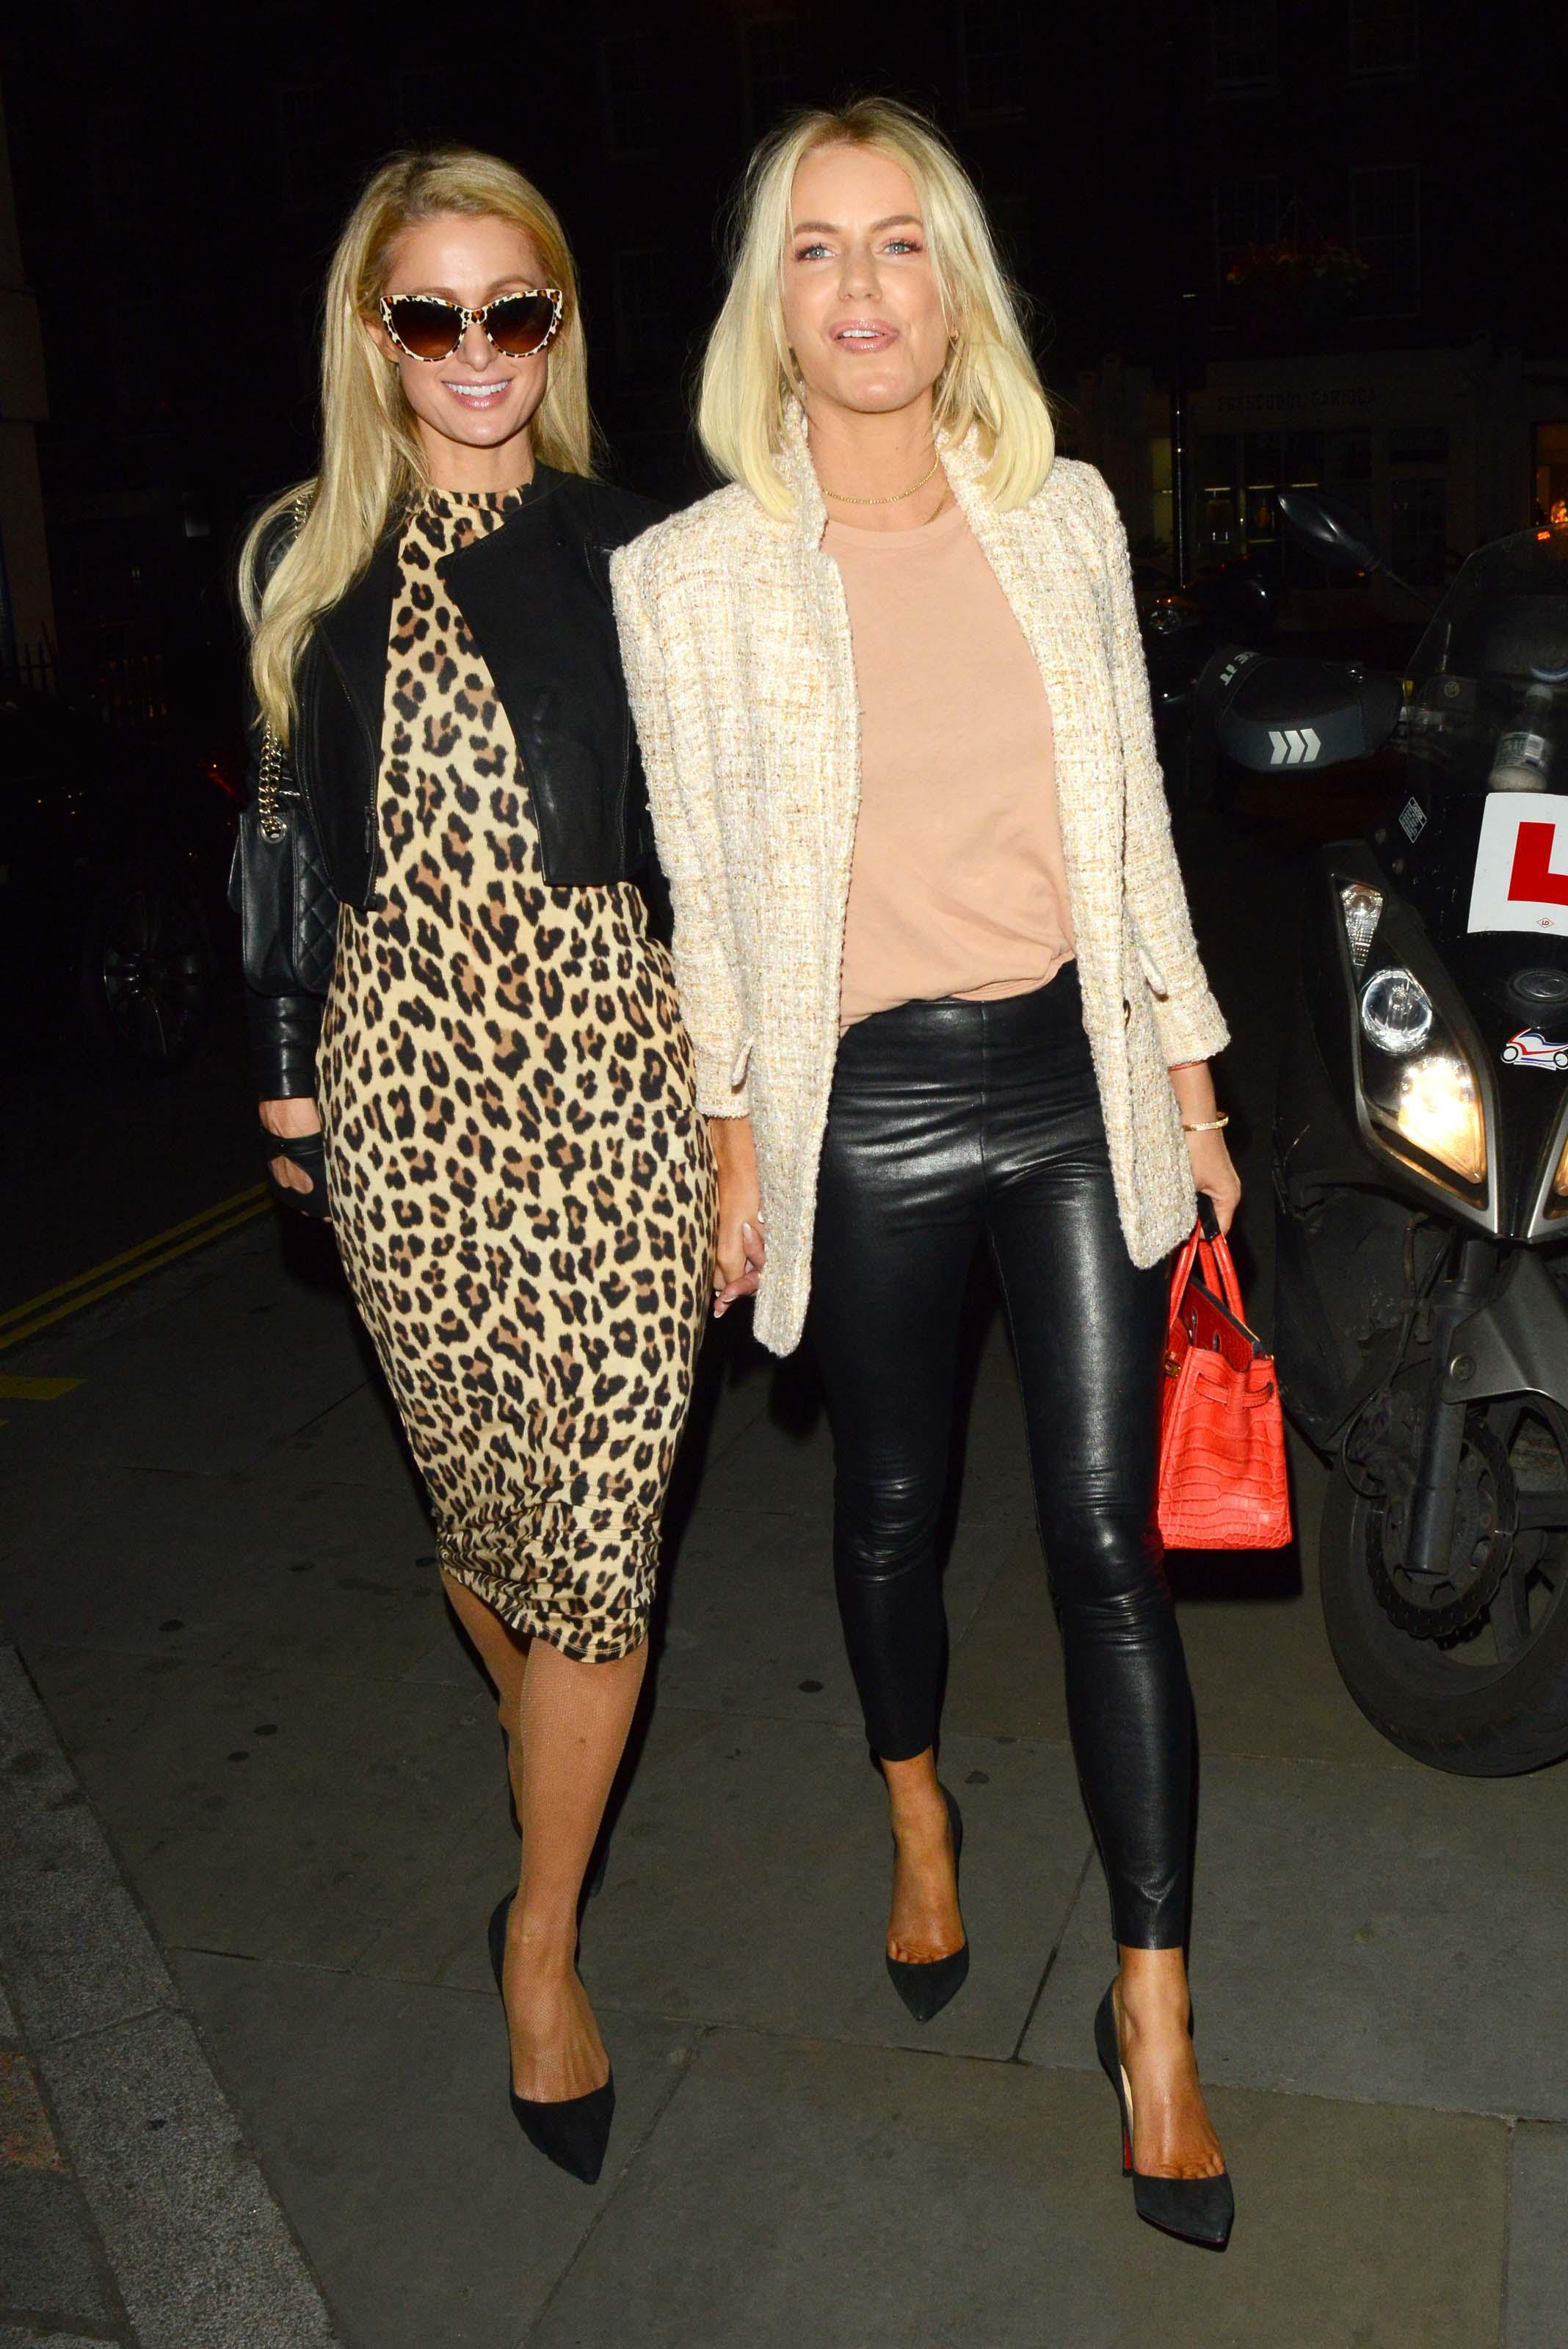 Paris Hilton & Caroline Stanbury arrive at Chiltern Firehouse